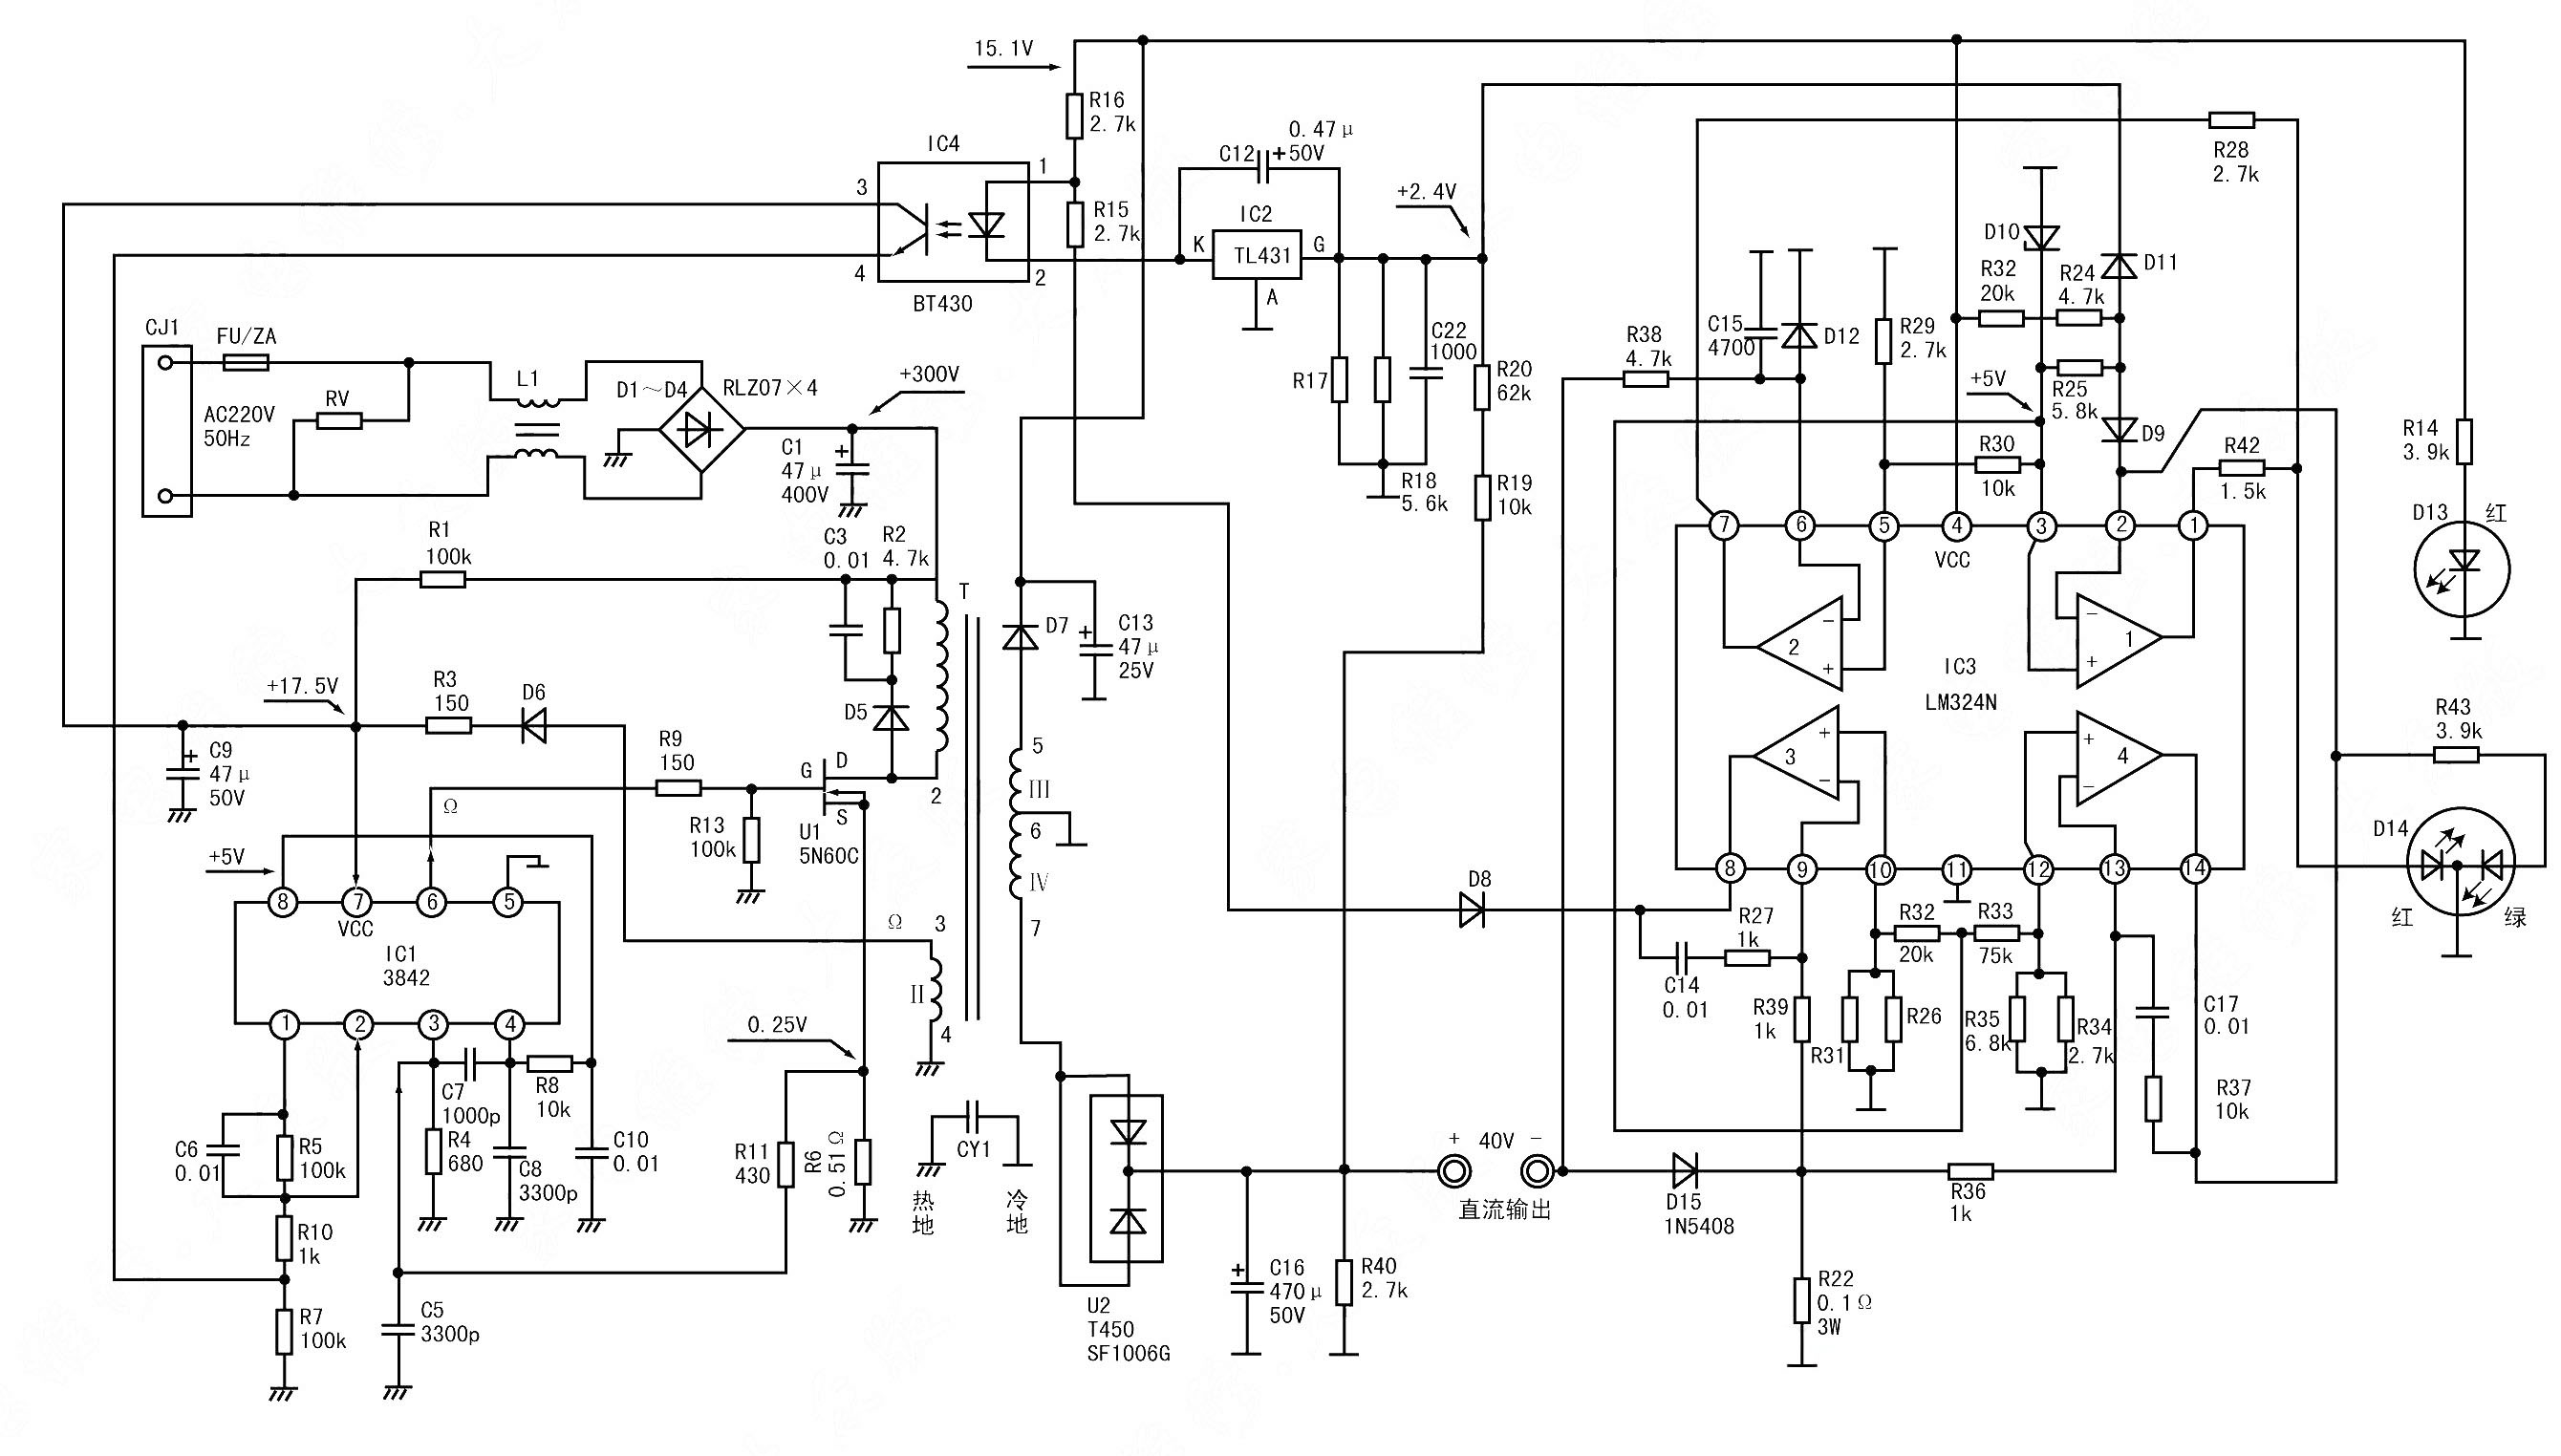 48v电动车充电器指示灯亮,有输出电压为55.